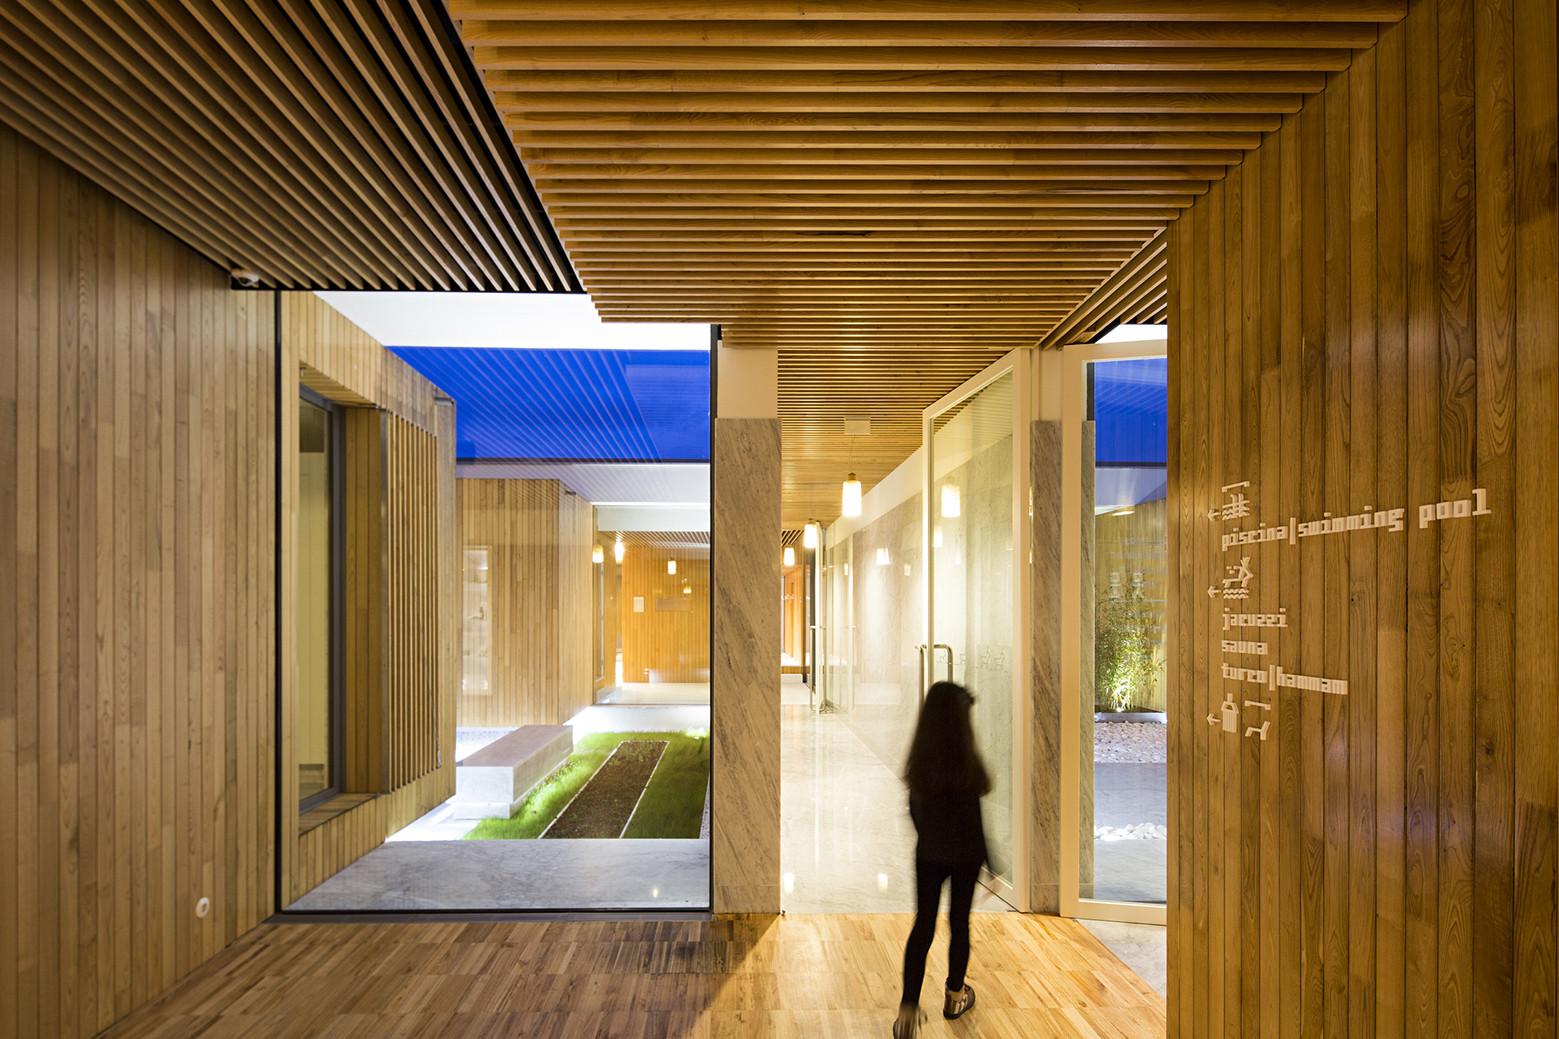 Hotel MINHO Renewal and Expansion / ,i , © Nelson Garrido